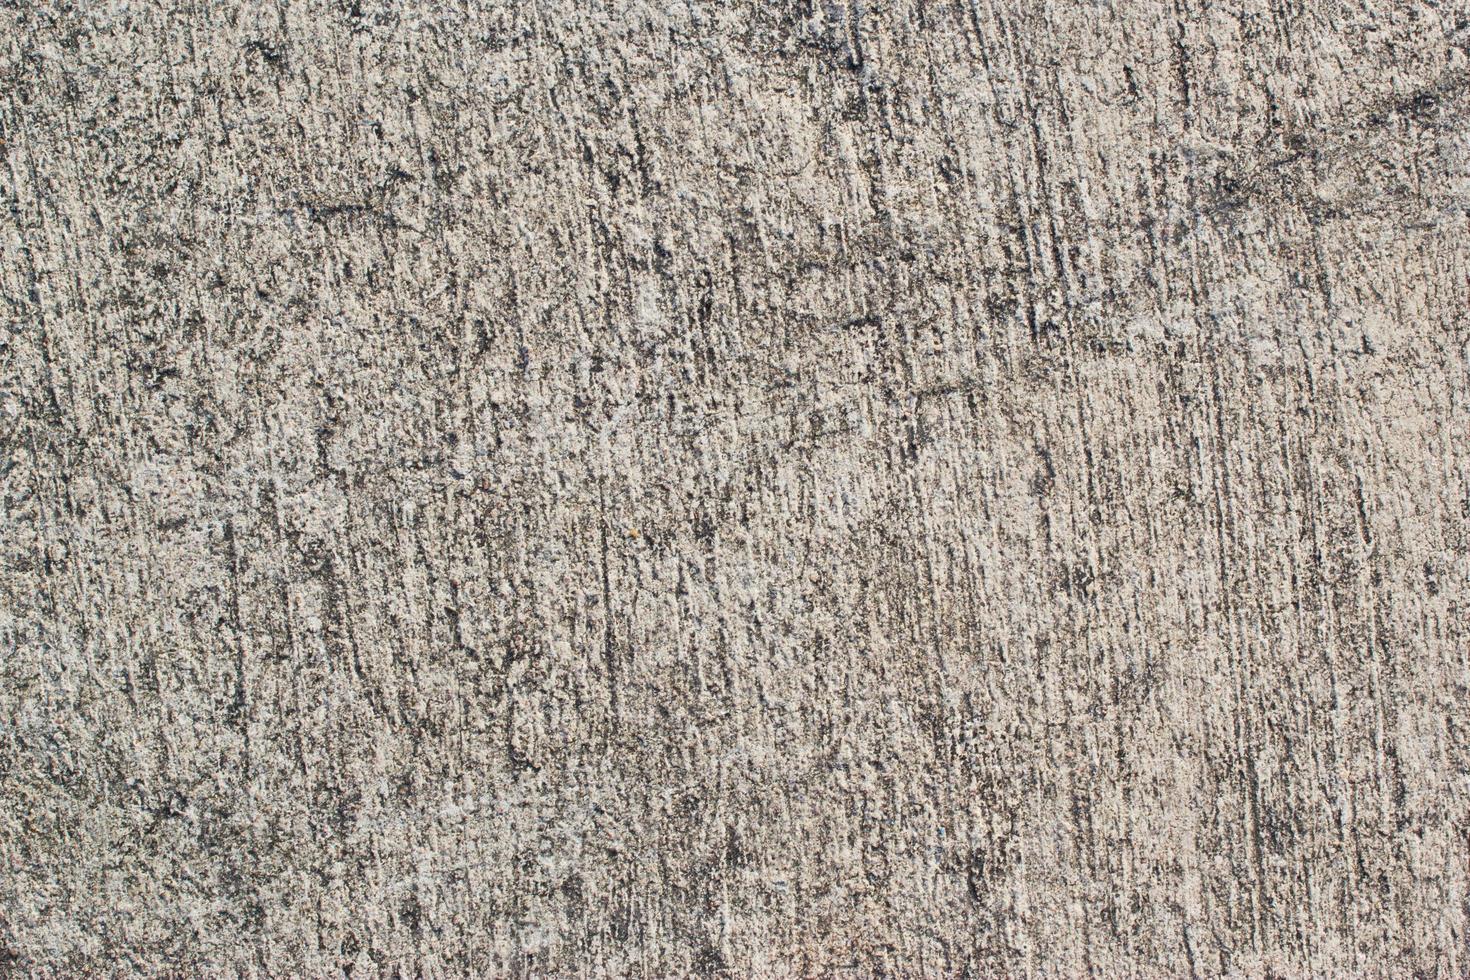 fondo de cemento blanco sucio foto